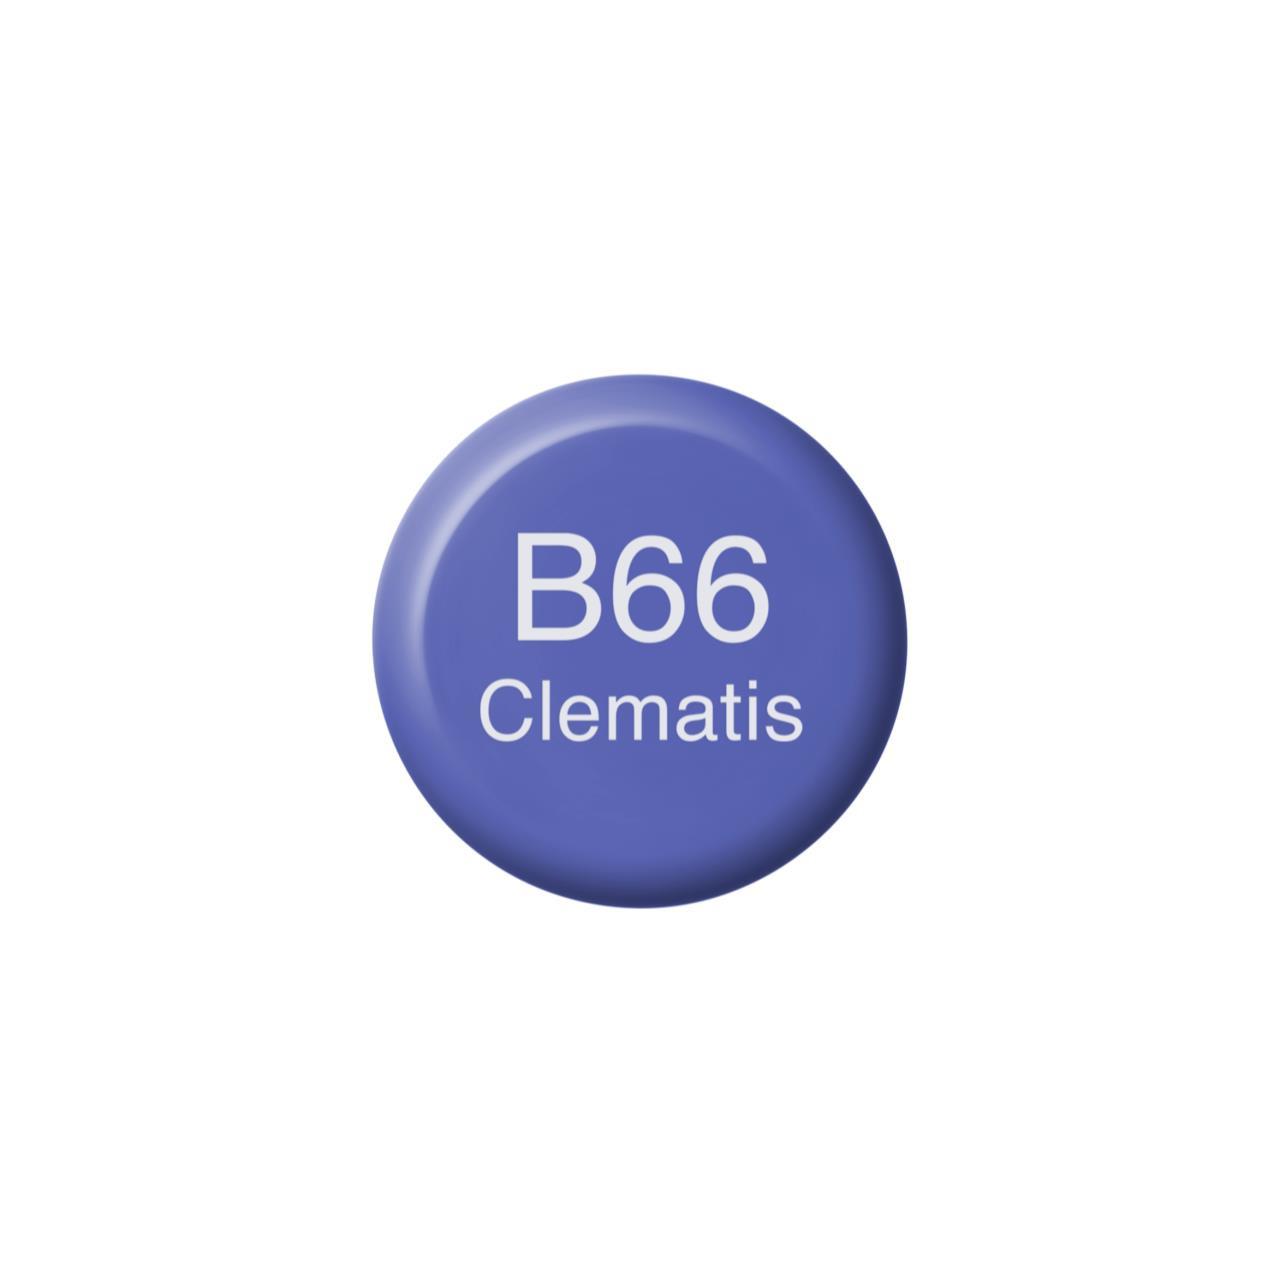 B66 Clemantis, Copic Ink - 4511338056073